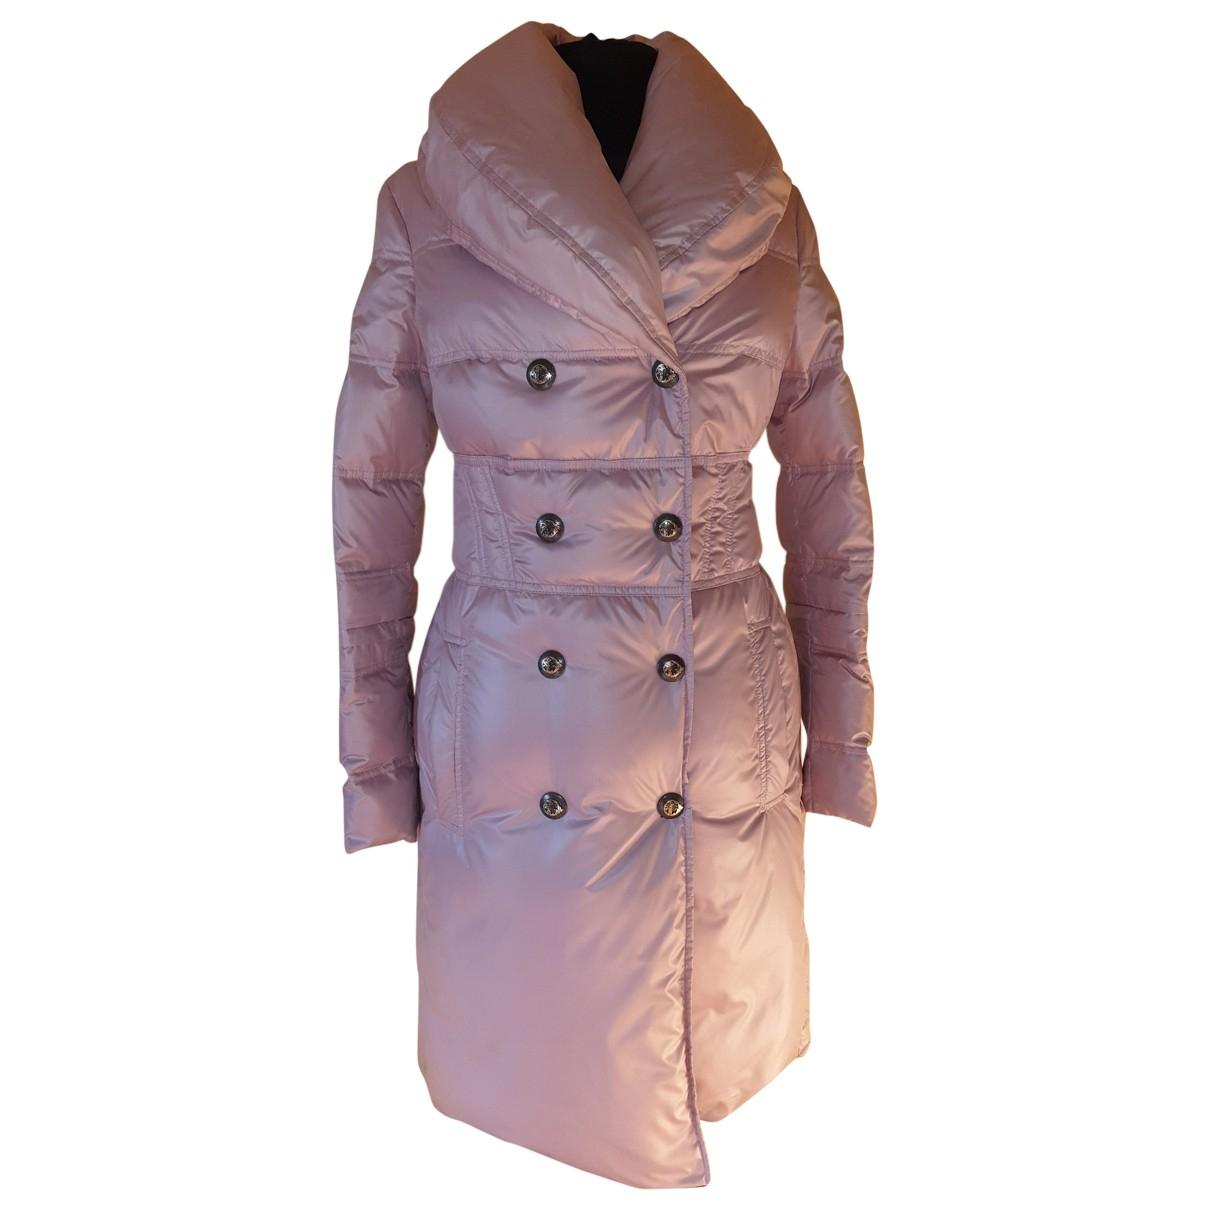 Gianni Versace \N Pink coat for Women 38 IT